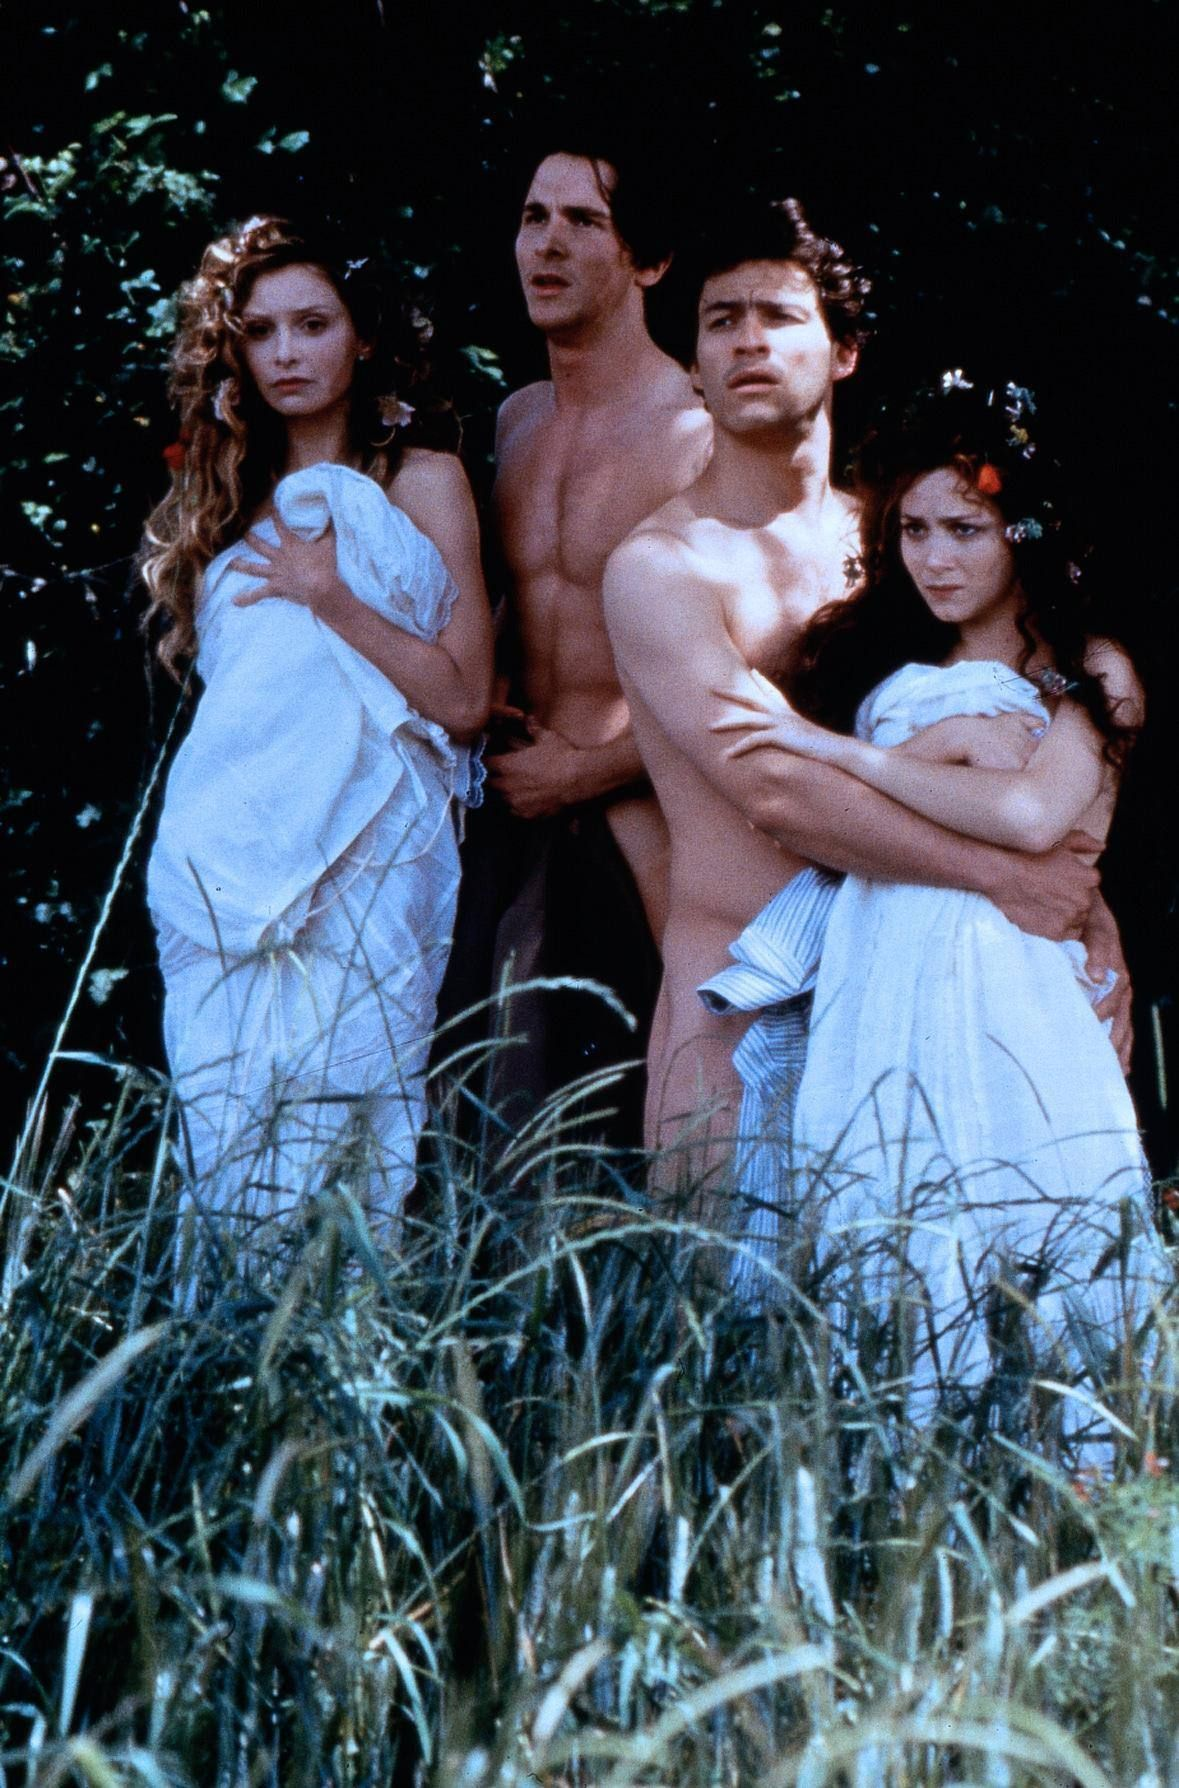 Christian Bale, Dominic West, Calista Flockhart, Anna ...Dominic West Midsummer Nights Dream